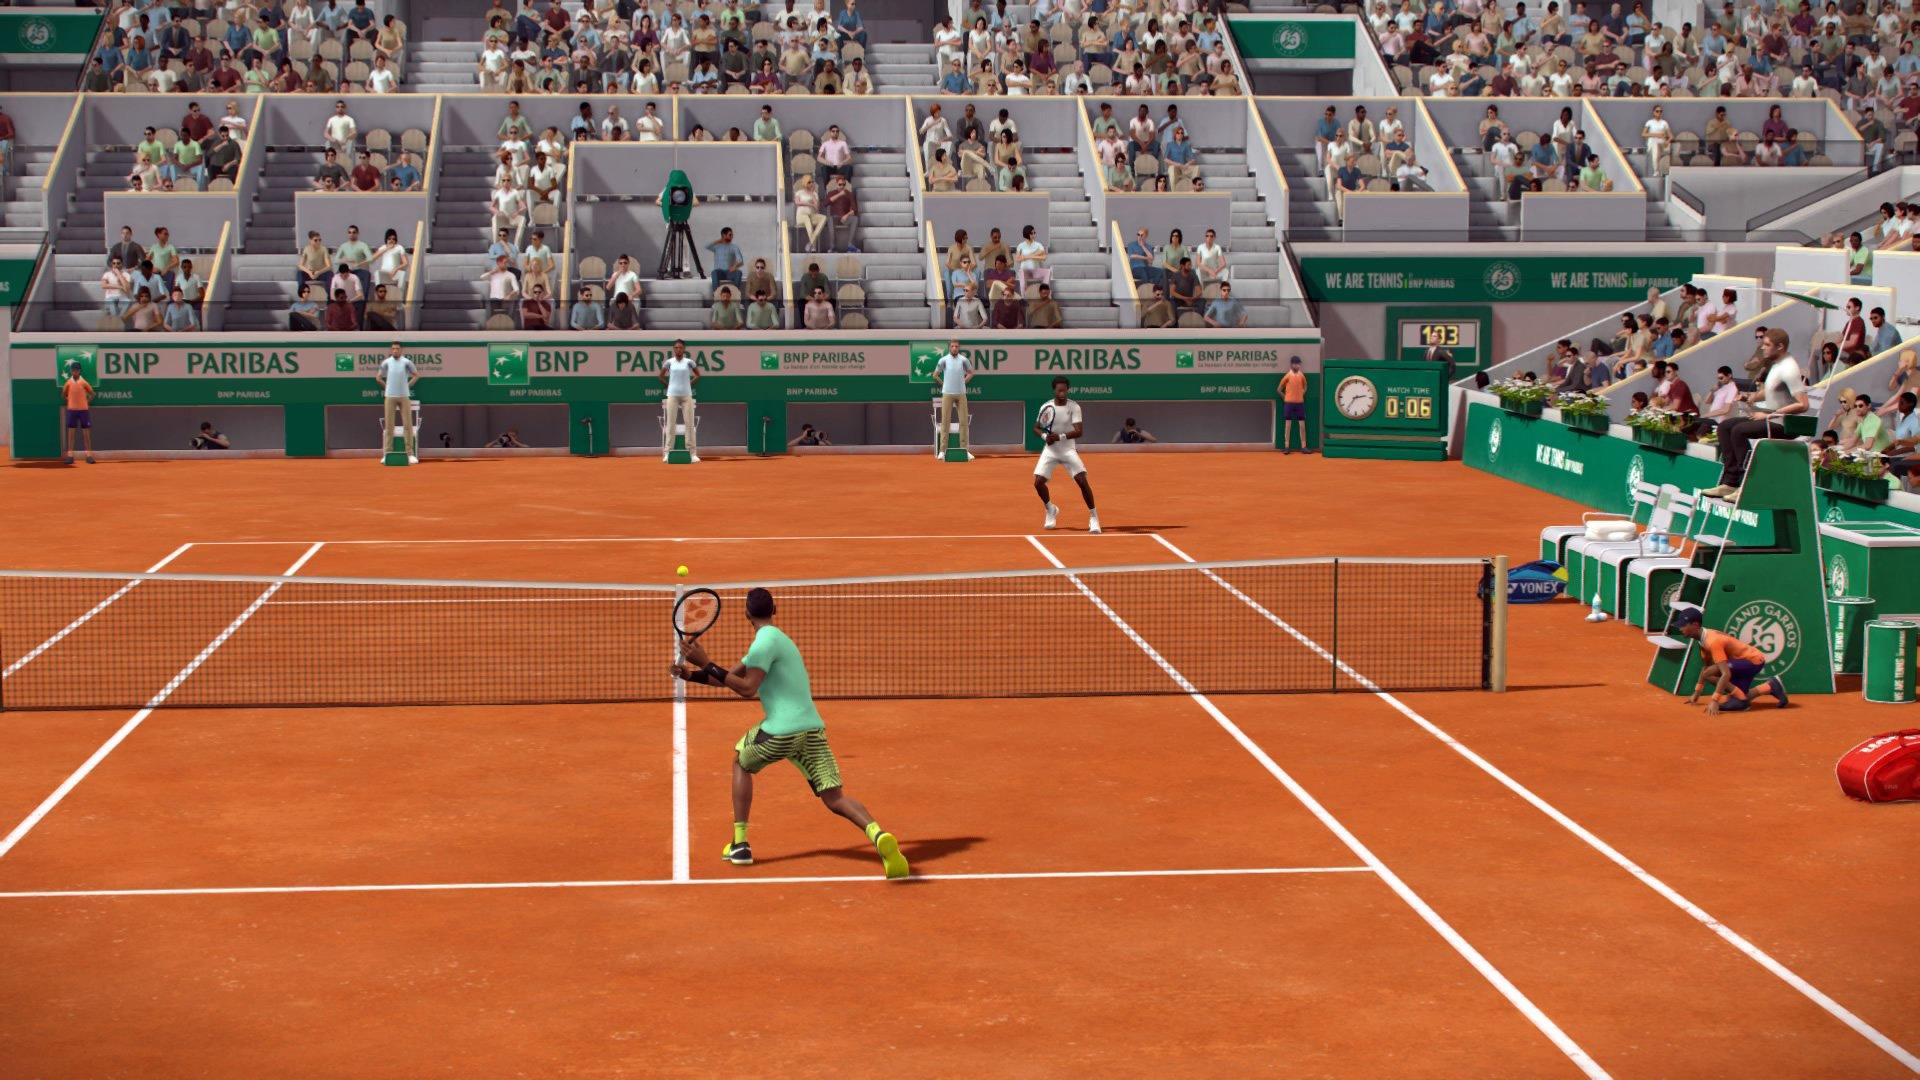 TennisWorldTour-RolandGarrosEdition Multi Test 011